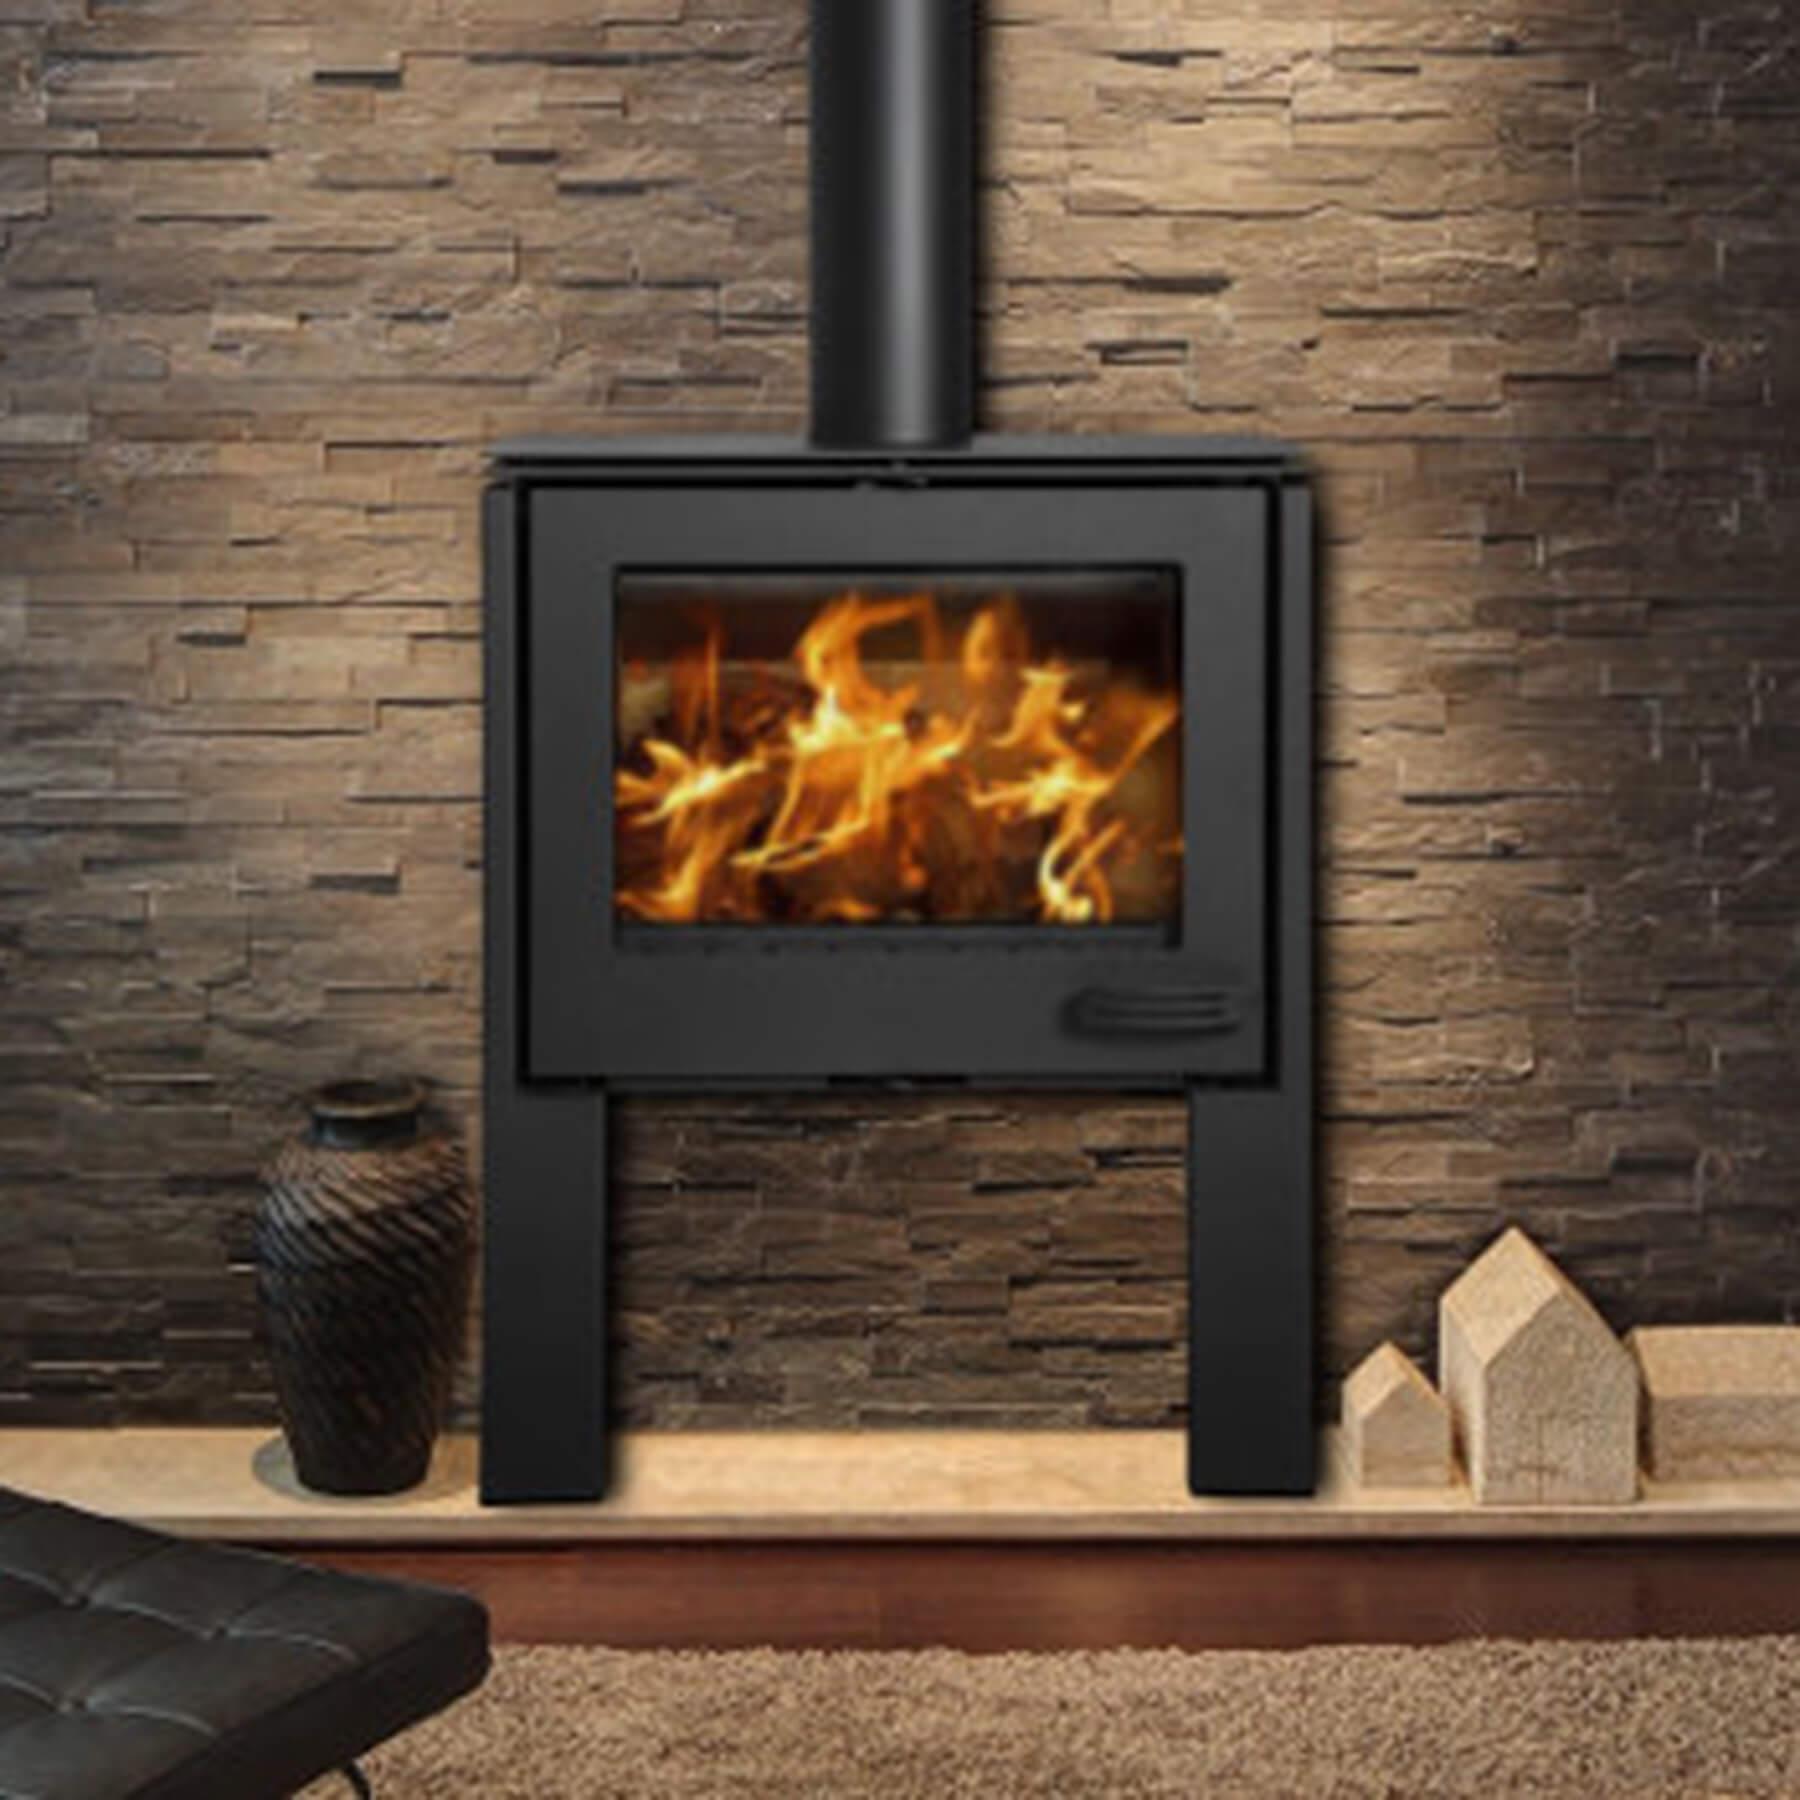 Combustion-Fireplaces-Freestanding-13kw-Convection-Unit-Black-Legs-Environment